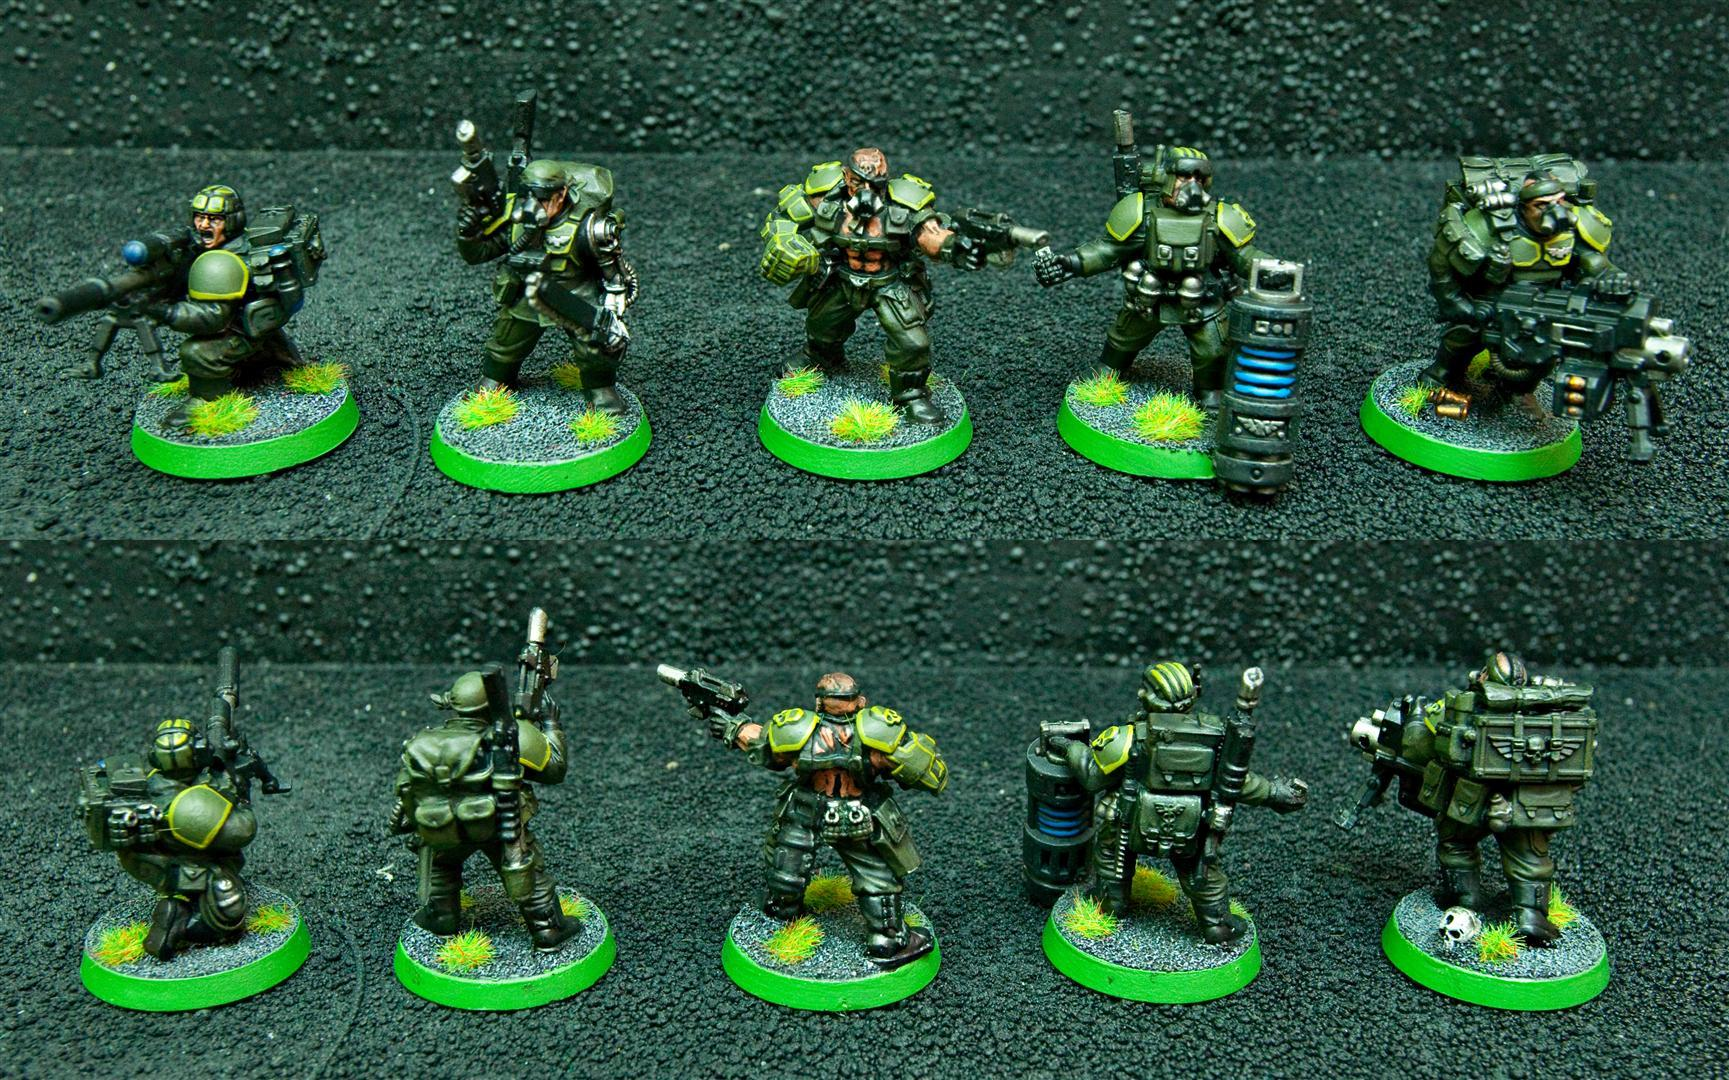 Astra Militarum, Bionics, Demolition Charge, Demolitions, Flamer, Guard, Guardsmen, Imperial Guard, Imperial Guard Veteran Squad, Meltabomb, Meltagun, Power Fist, Sgt, Sniper Rifle, Targeter, Veteran